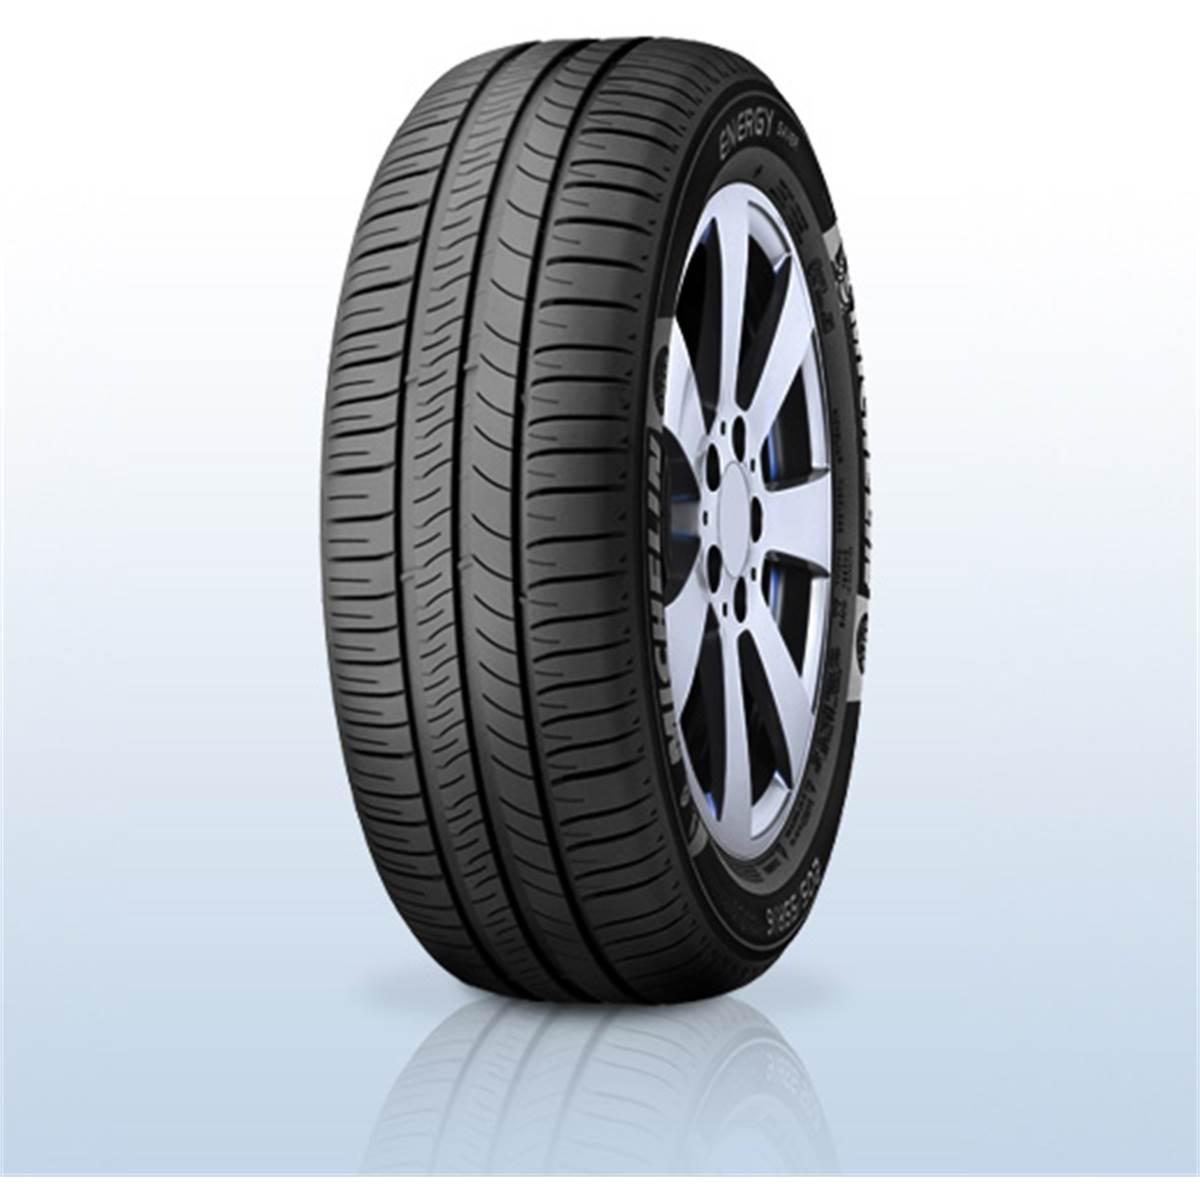 Pneu Michelin 185/55R16 83V Energy Saver +